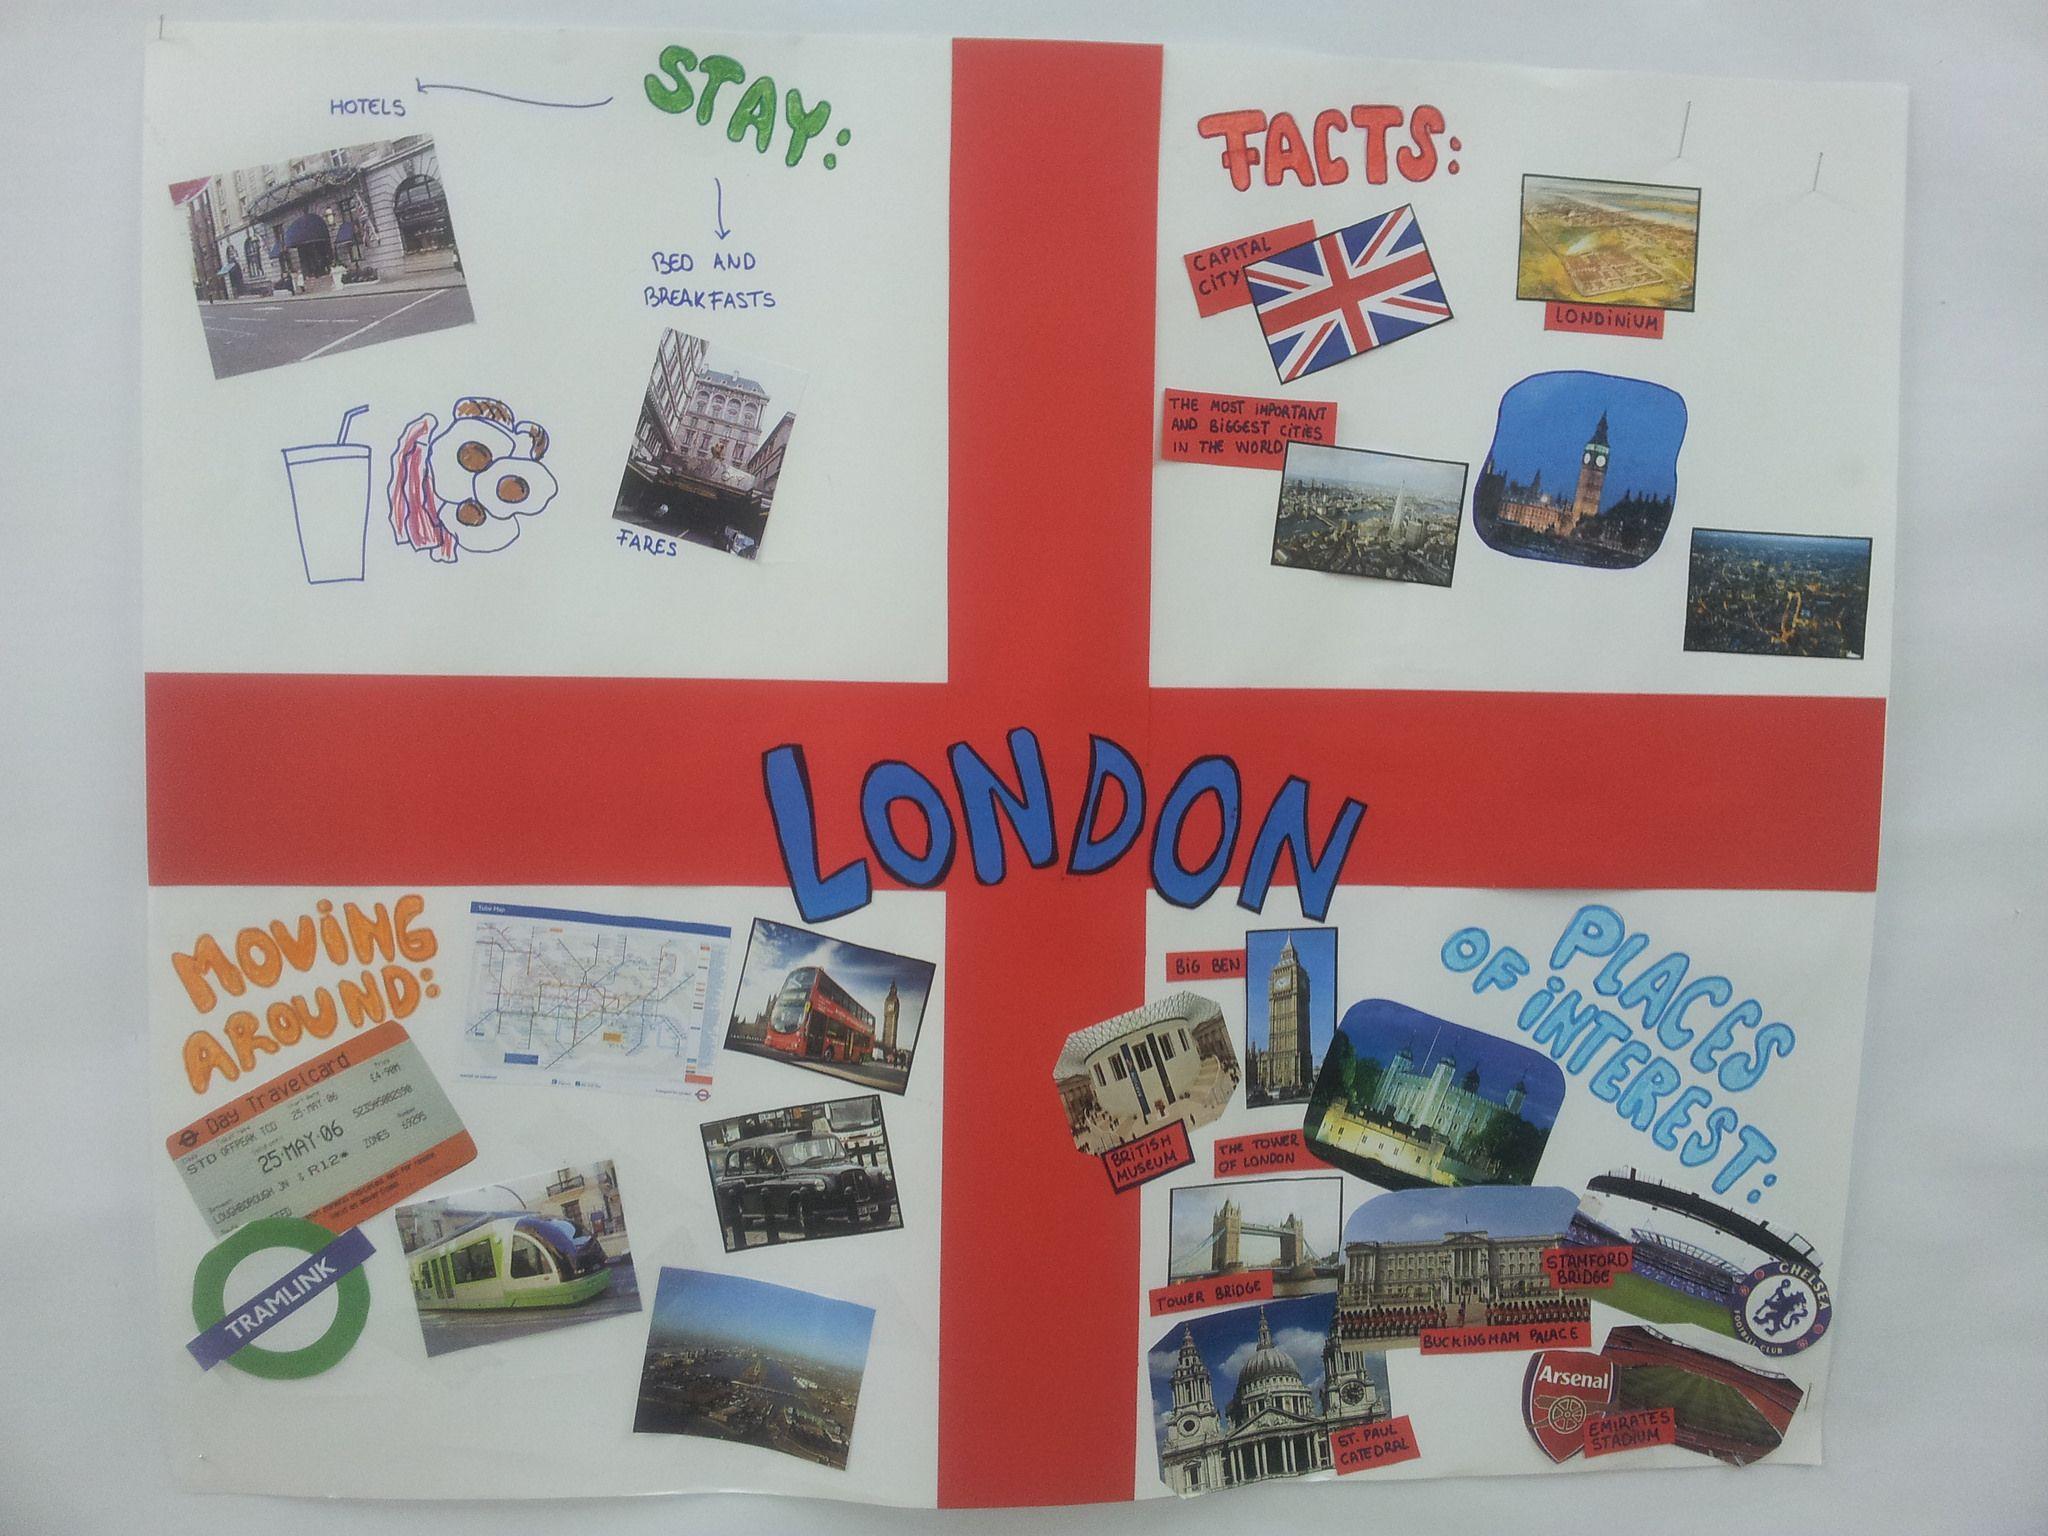 httpsflickrpjhkrFY Mind Mapping London January